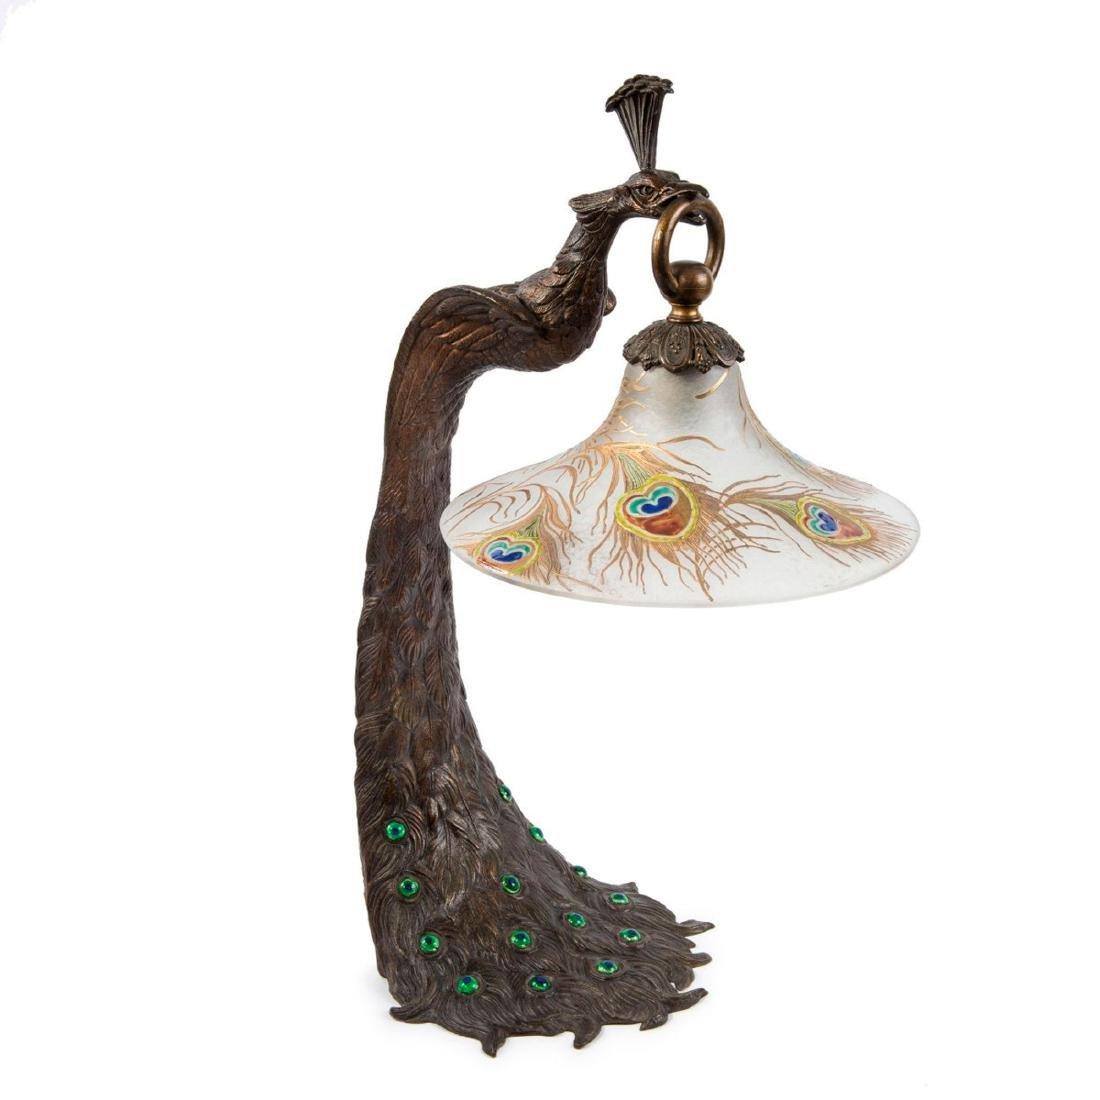 'Paon' table light, c. 1910